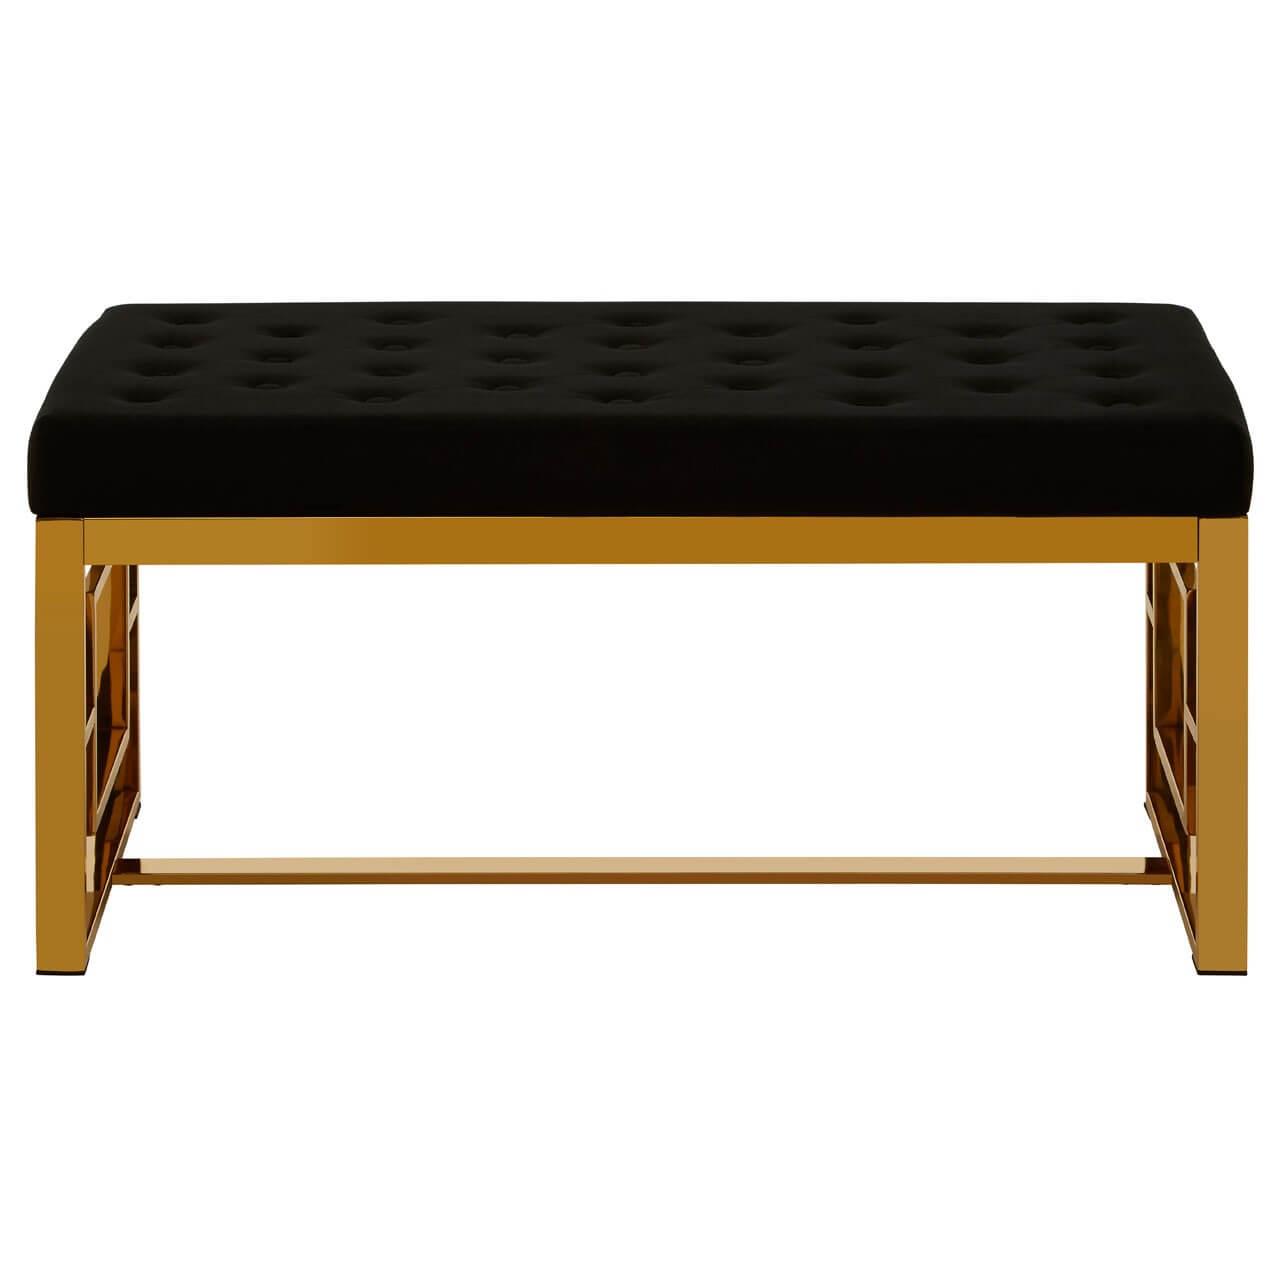 Adolph Black Velvet And Gold Metal Finish Bench Designer Sofas 4u